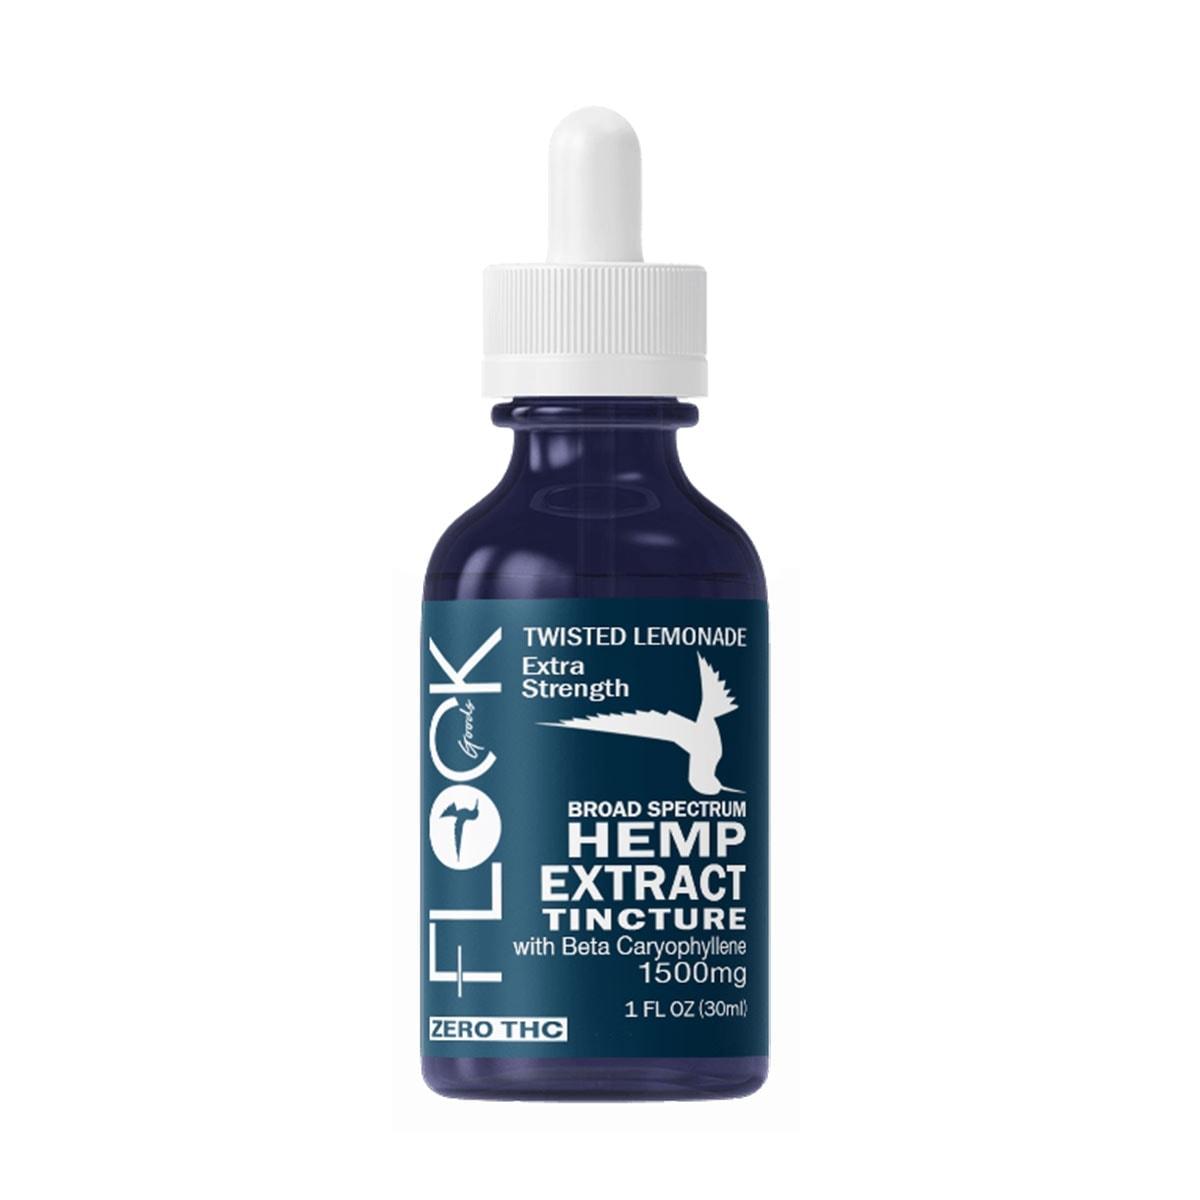 Flock-Goods,-Hemp-Extract-Tincture,-Broad-Spectrum-THC-free,-Twisted-Lemonade,-1oz,-1500mg-of-CBD-